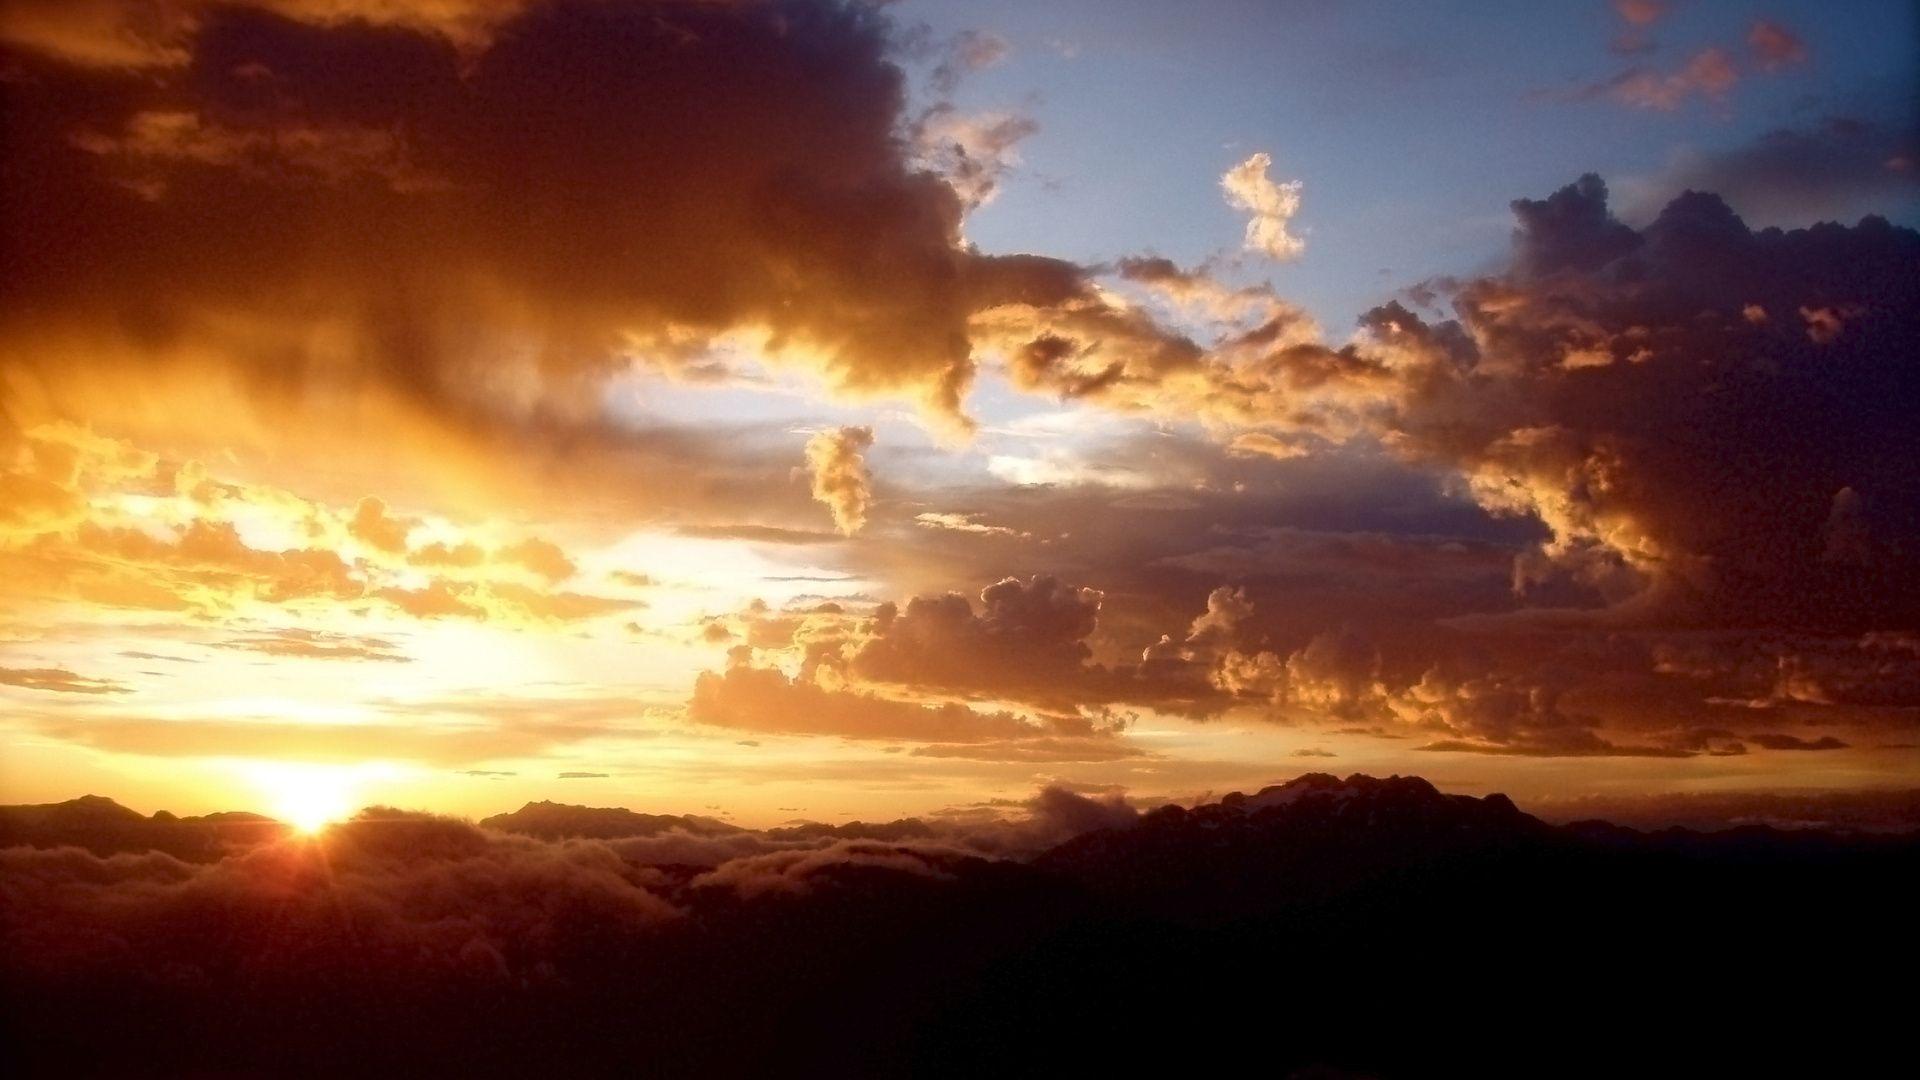 Download Wallpaper 1920x1080 Clouds, Sun, Sunset, Colors